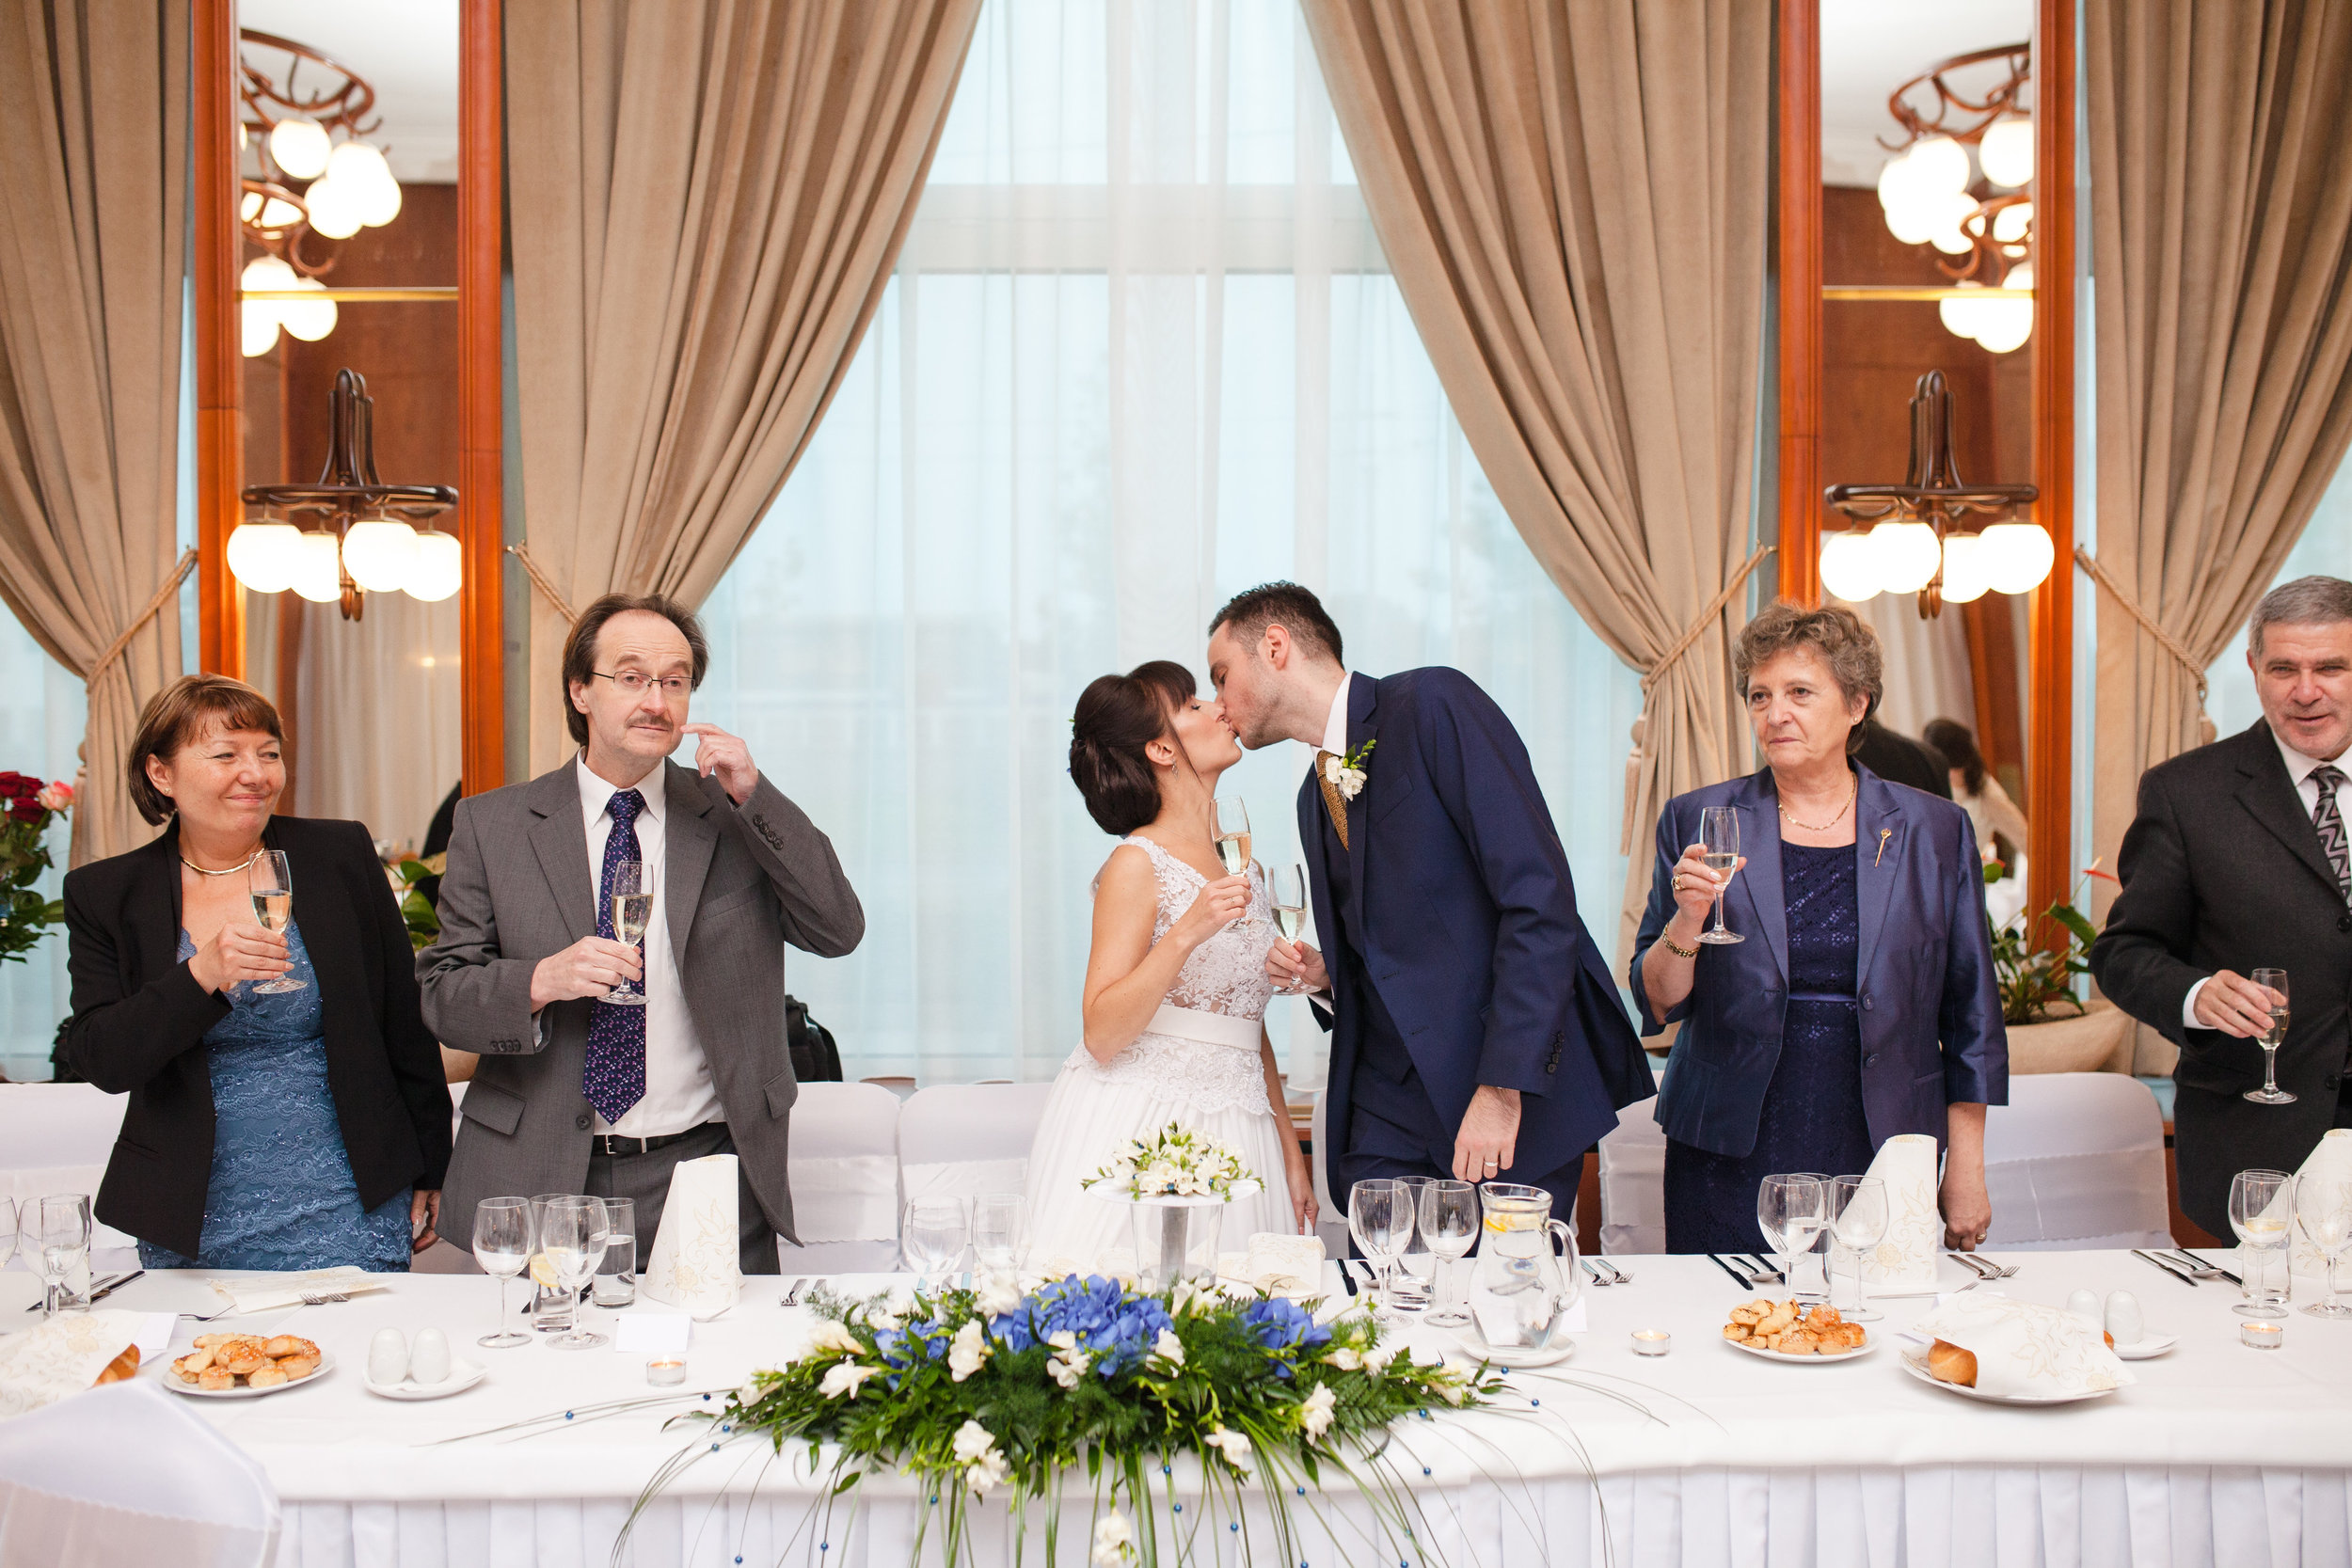 destination-wedding-photographer-slovakia-bratislava-reception-hotel-devin-kiss.jpg